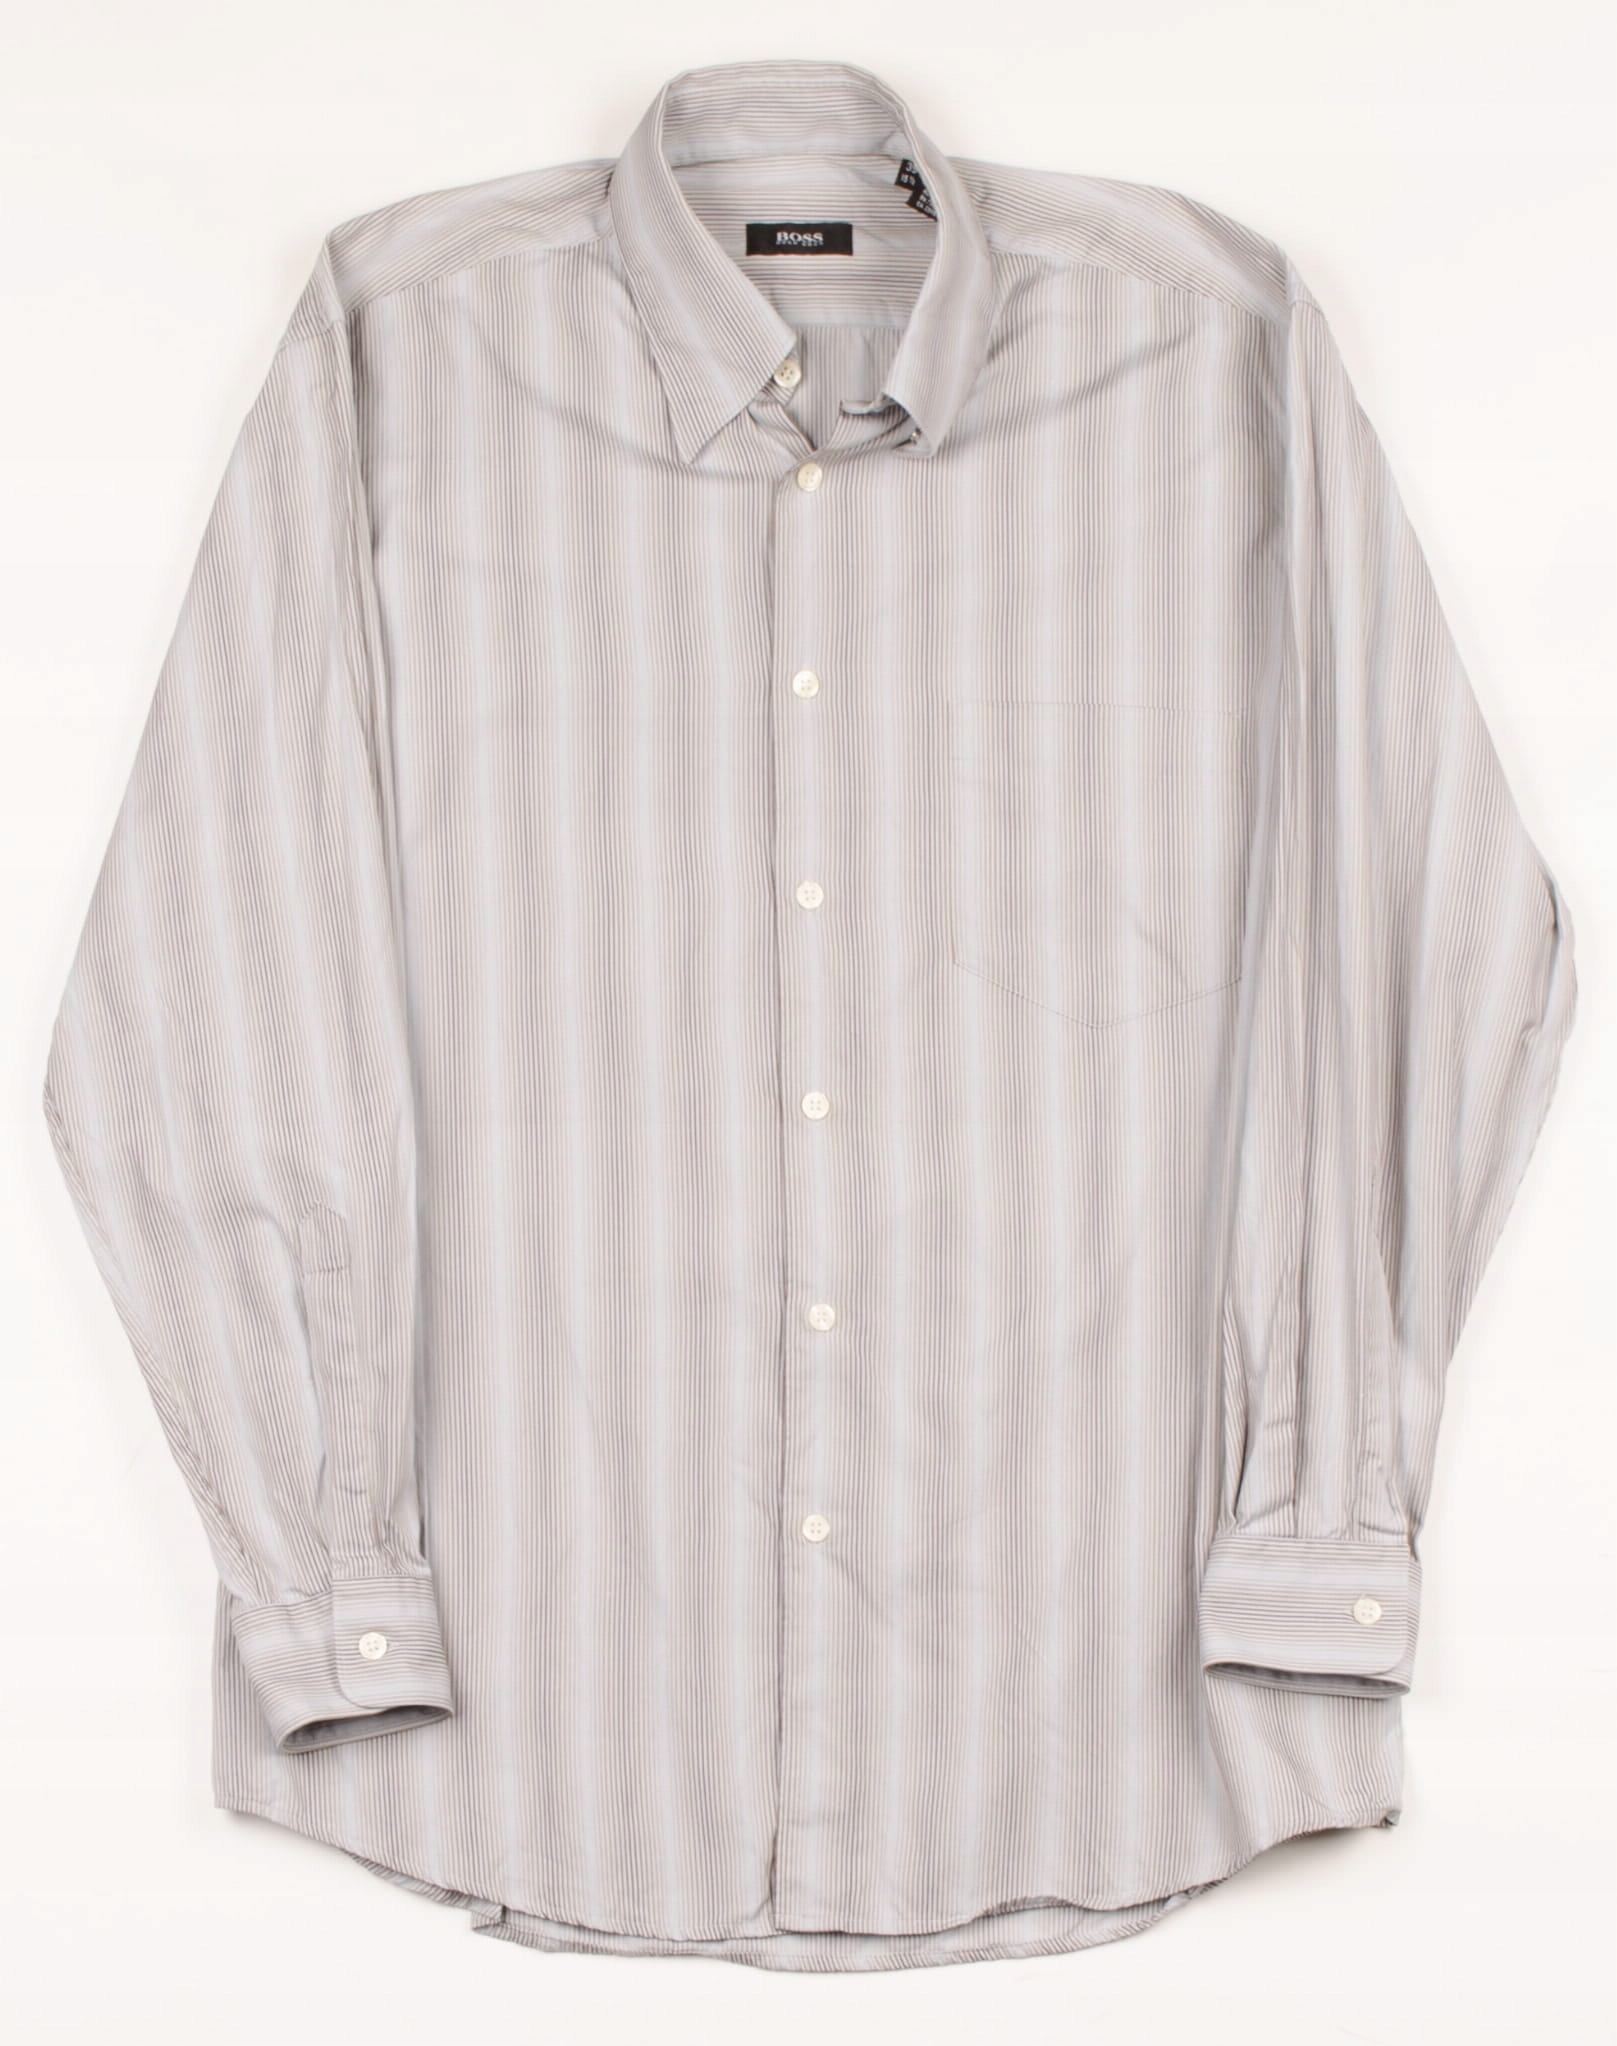 30301 Hugo Boss Koszula Męska XL